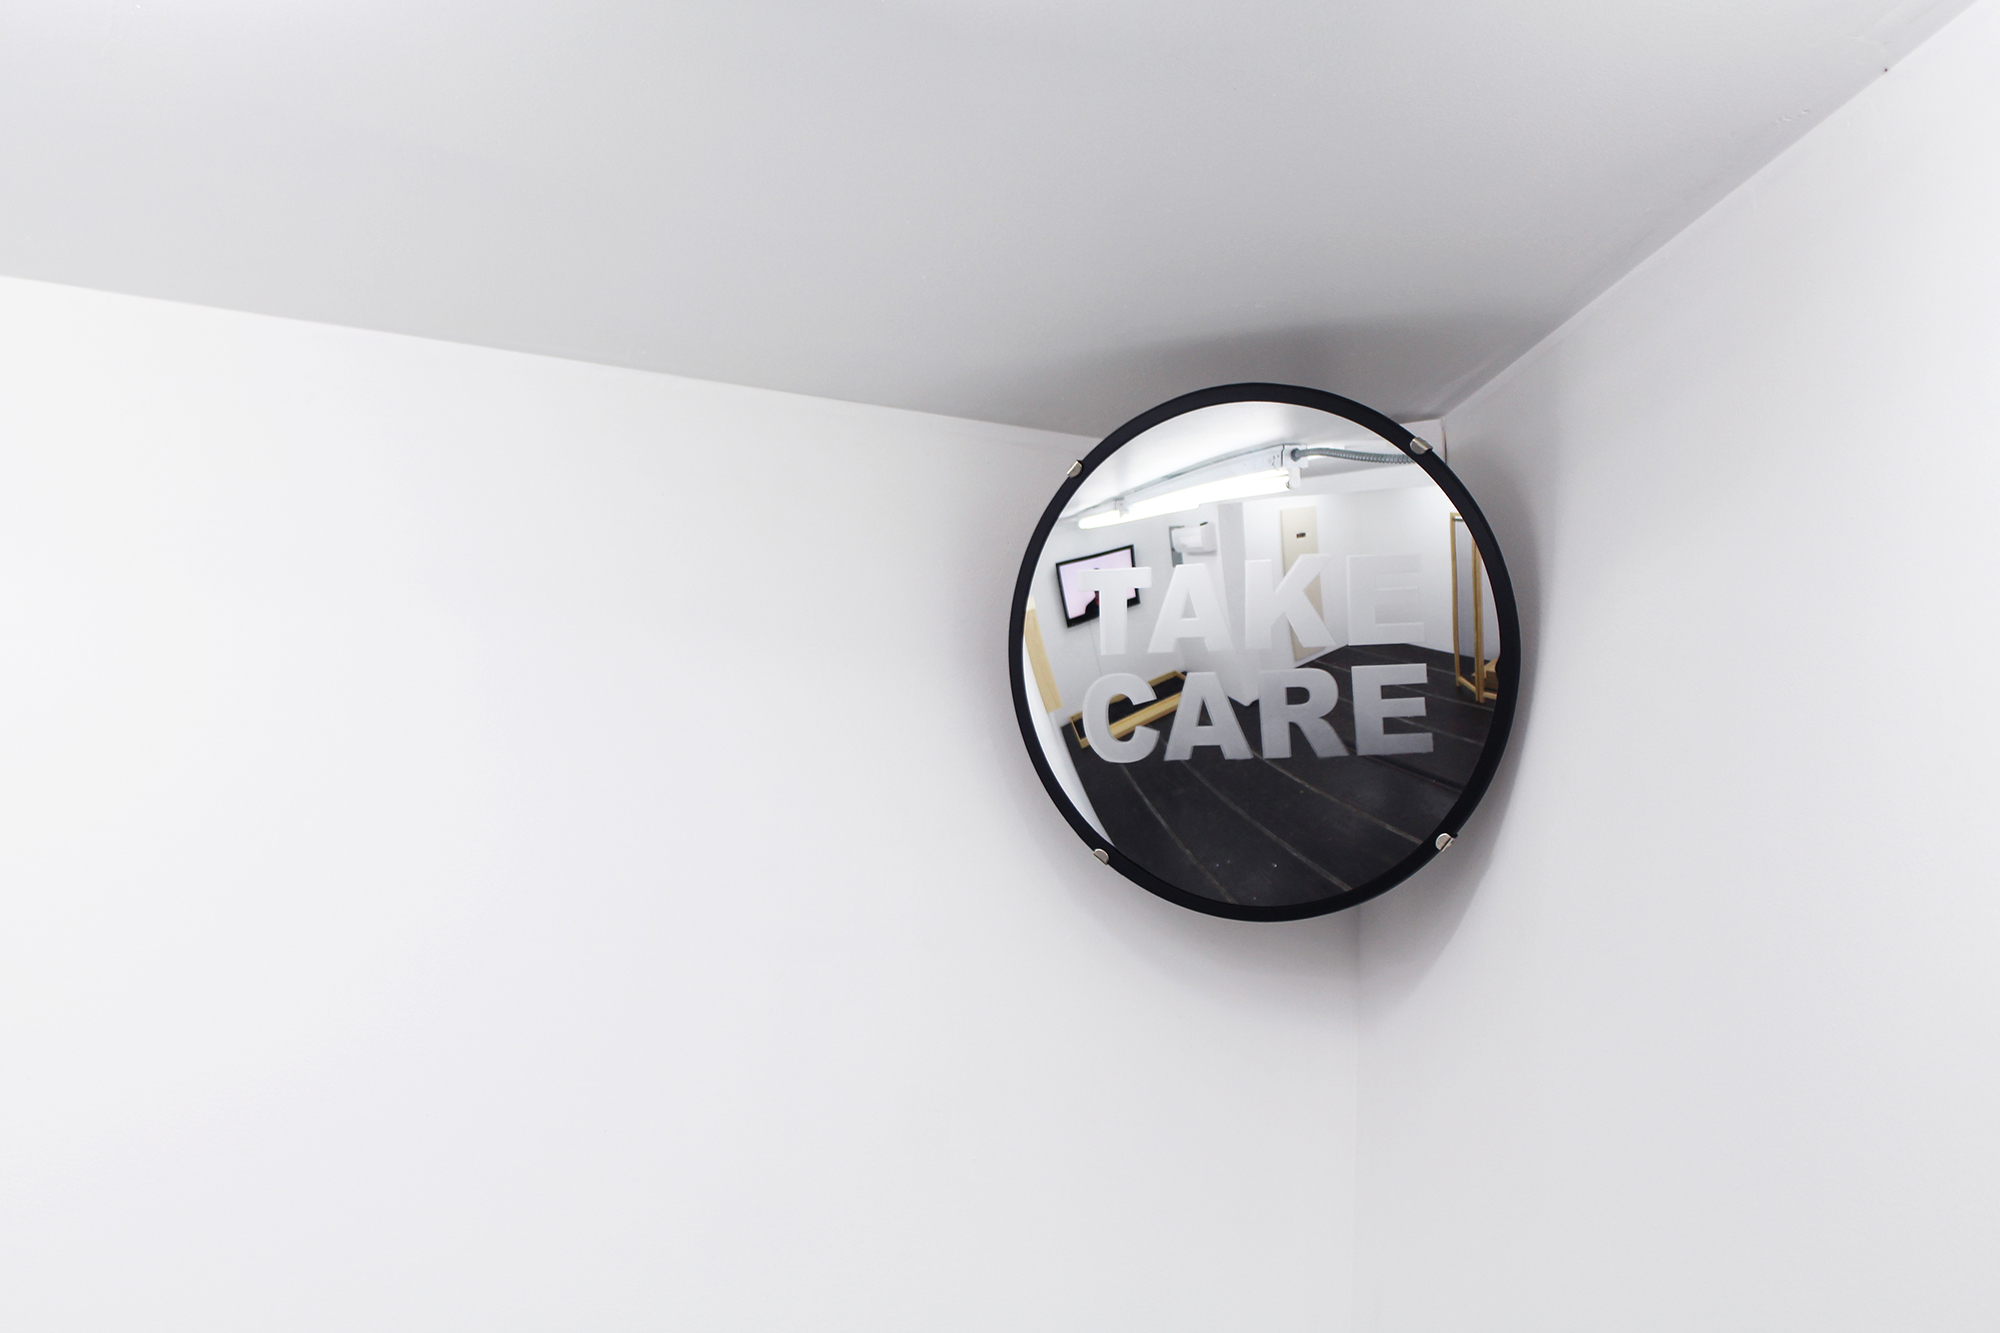 Convex mirror,semi-transparent spray paint